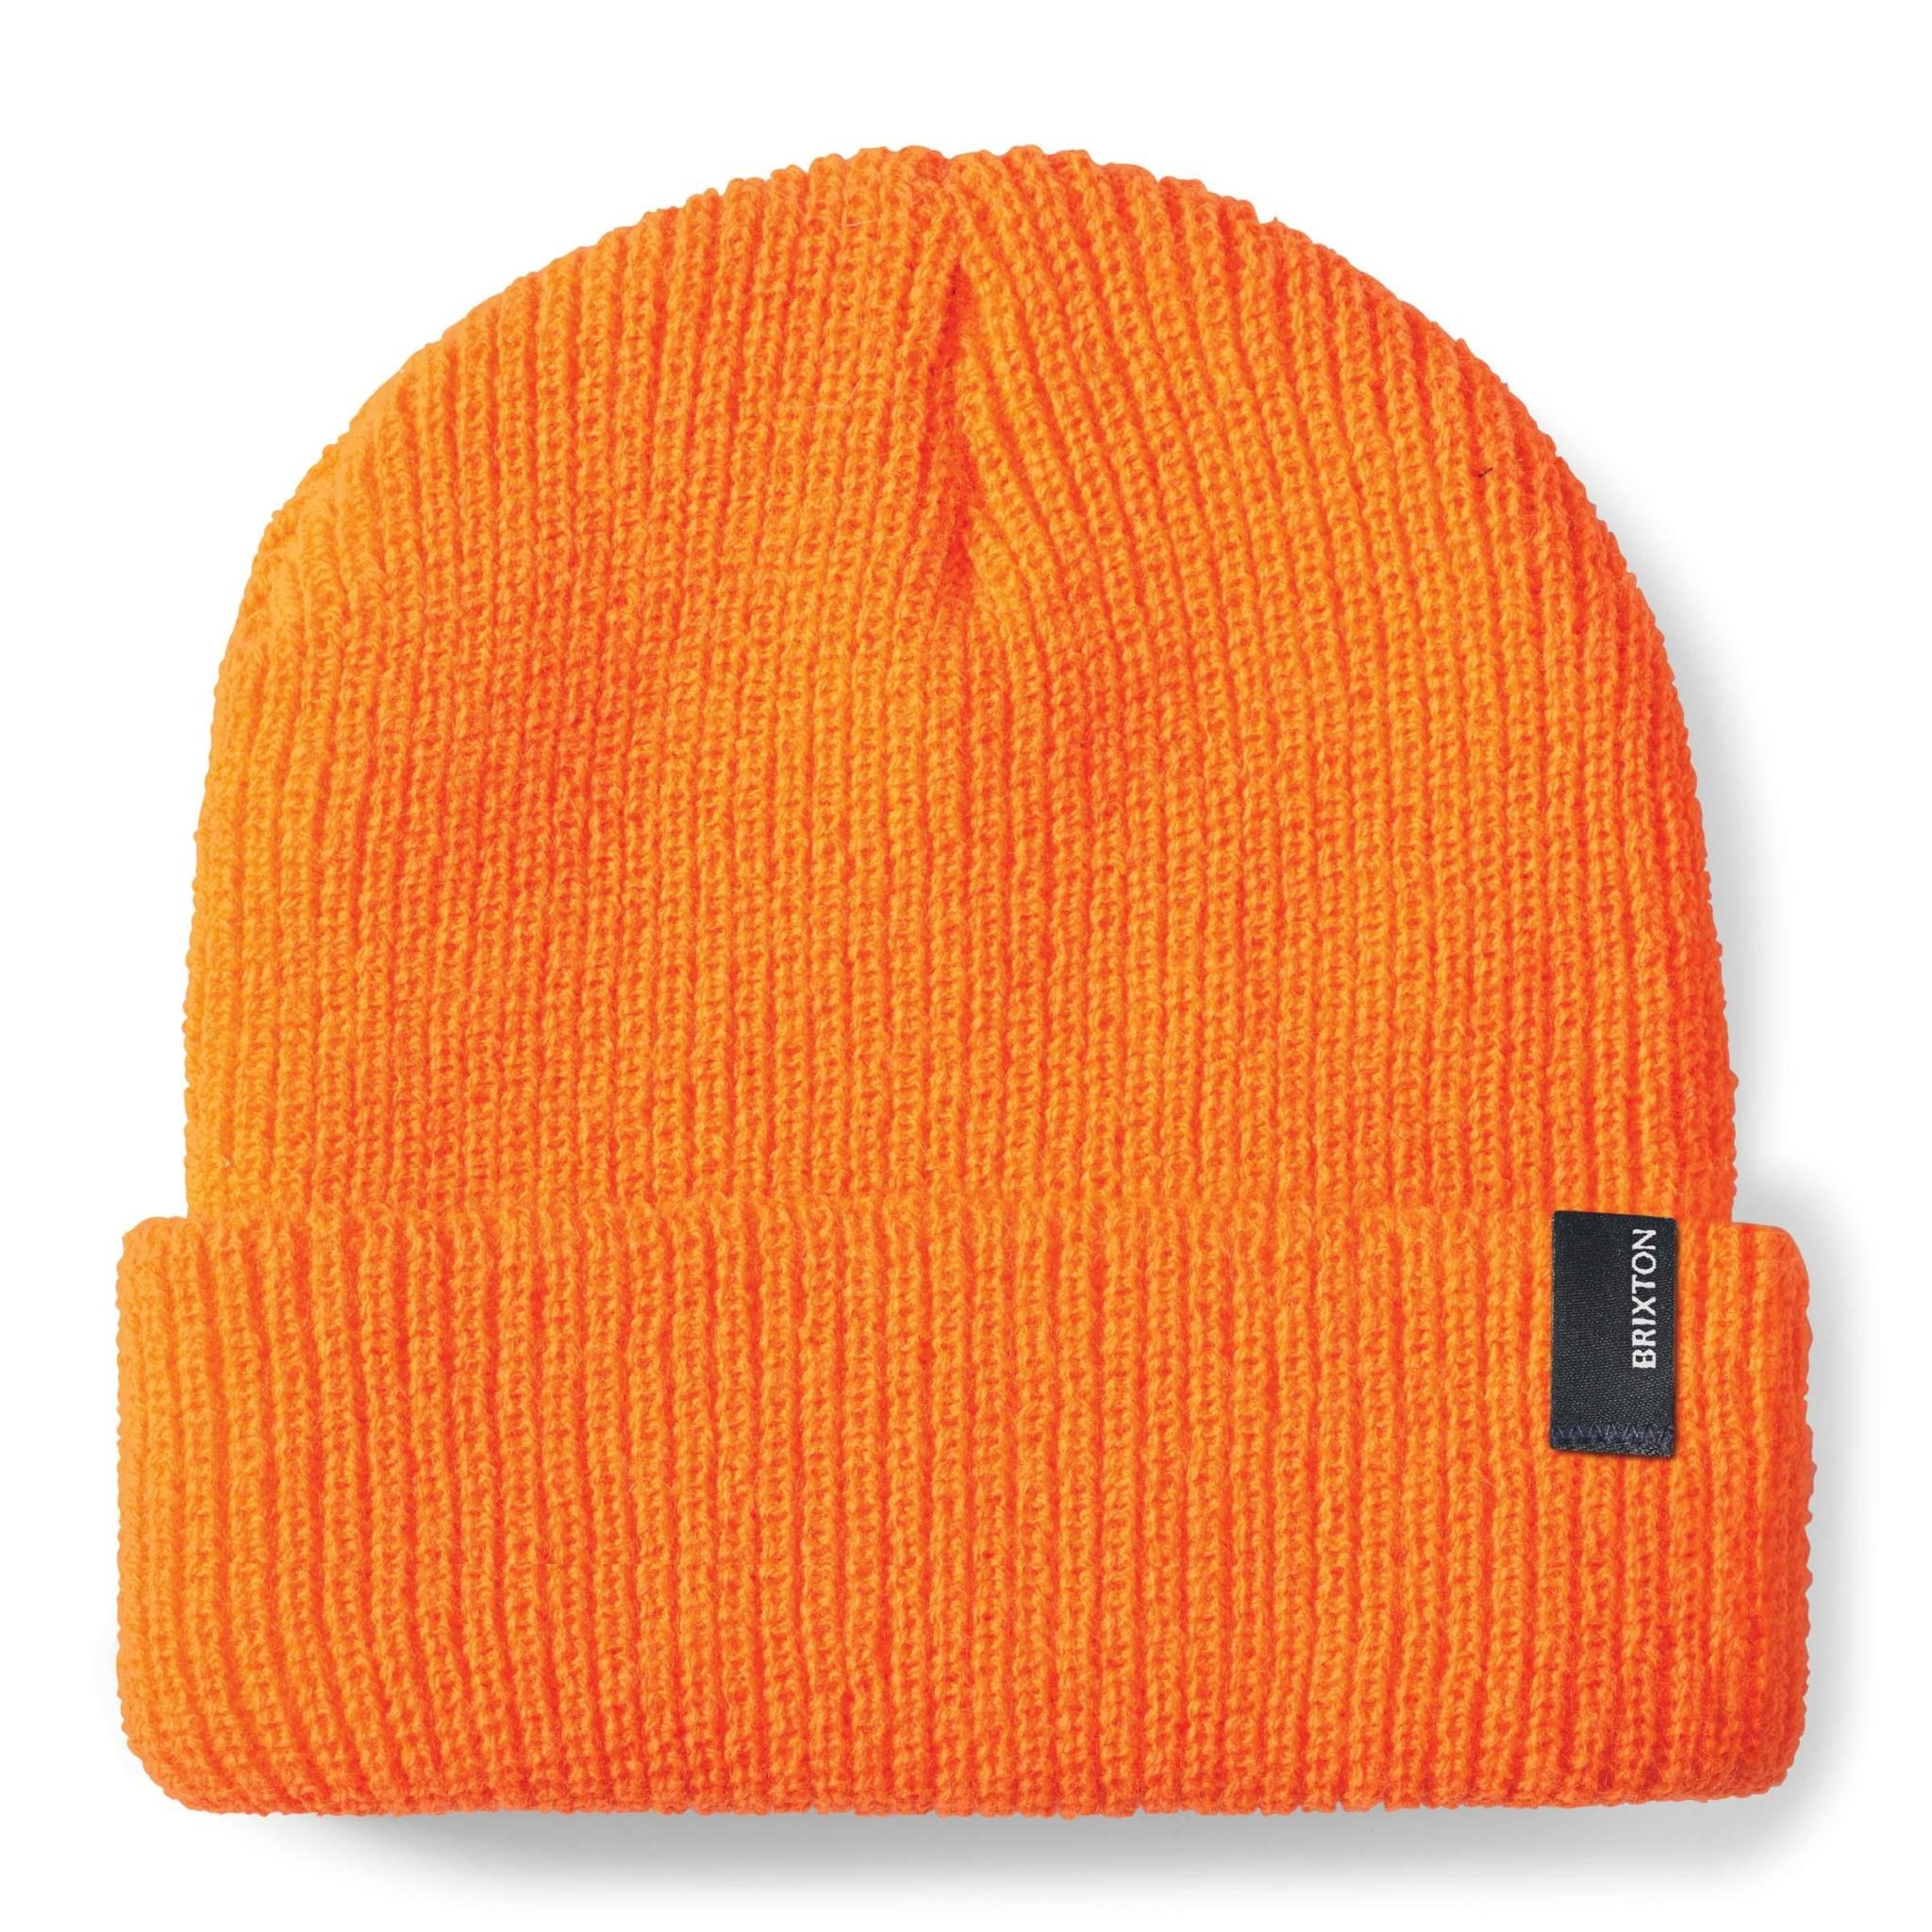 Brixton Brixton Heist Beanie - Athletic Orange